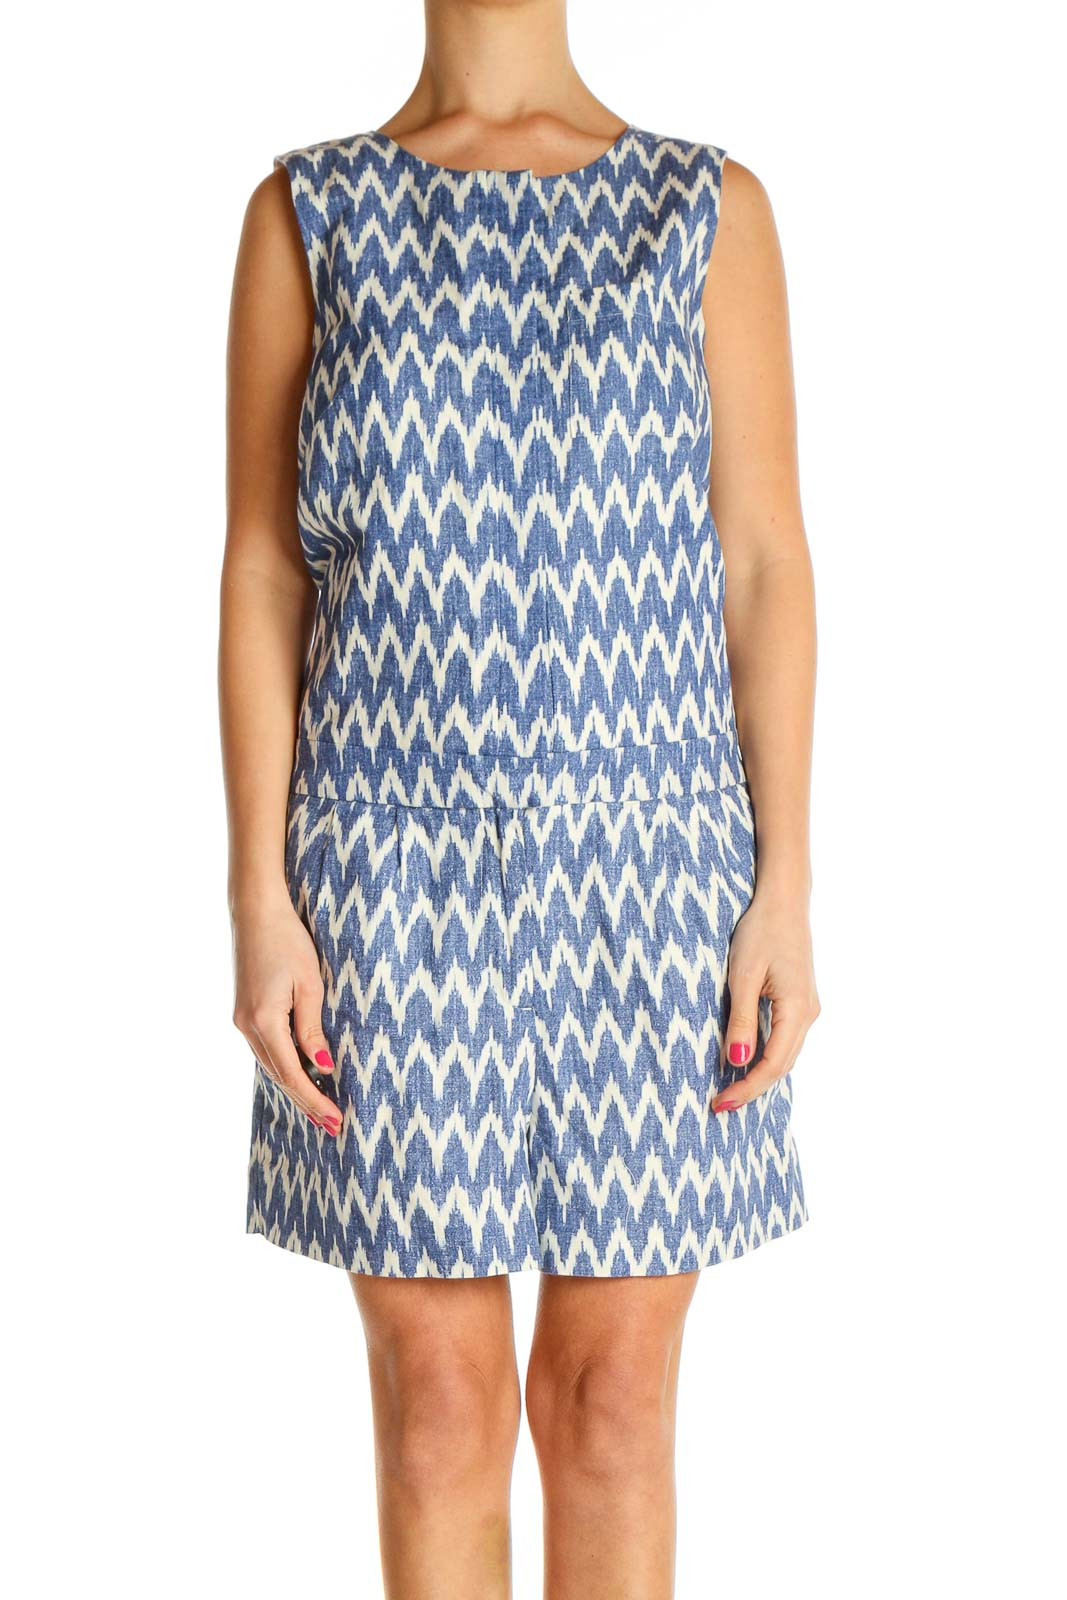 Blue Chevron Day A-Line Dress Front